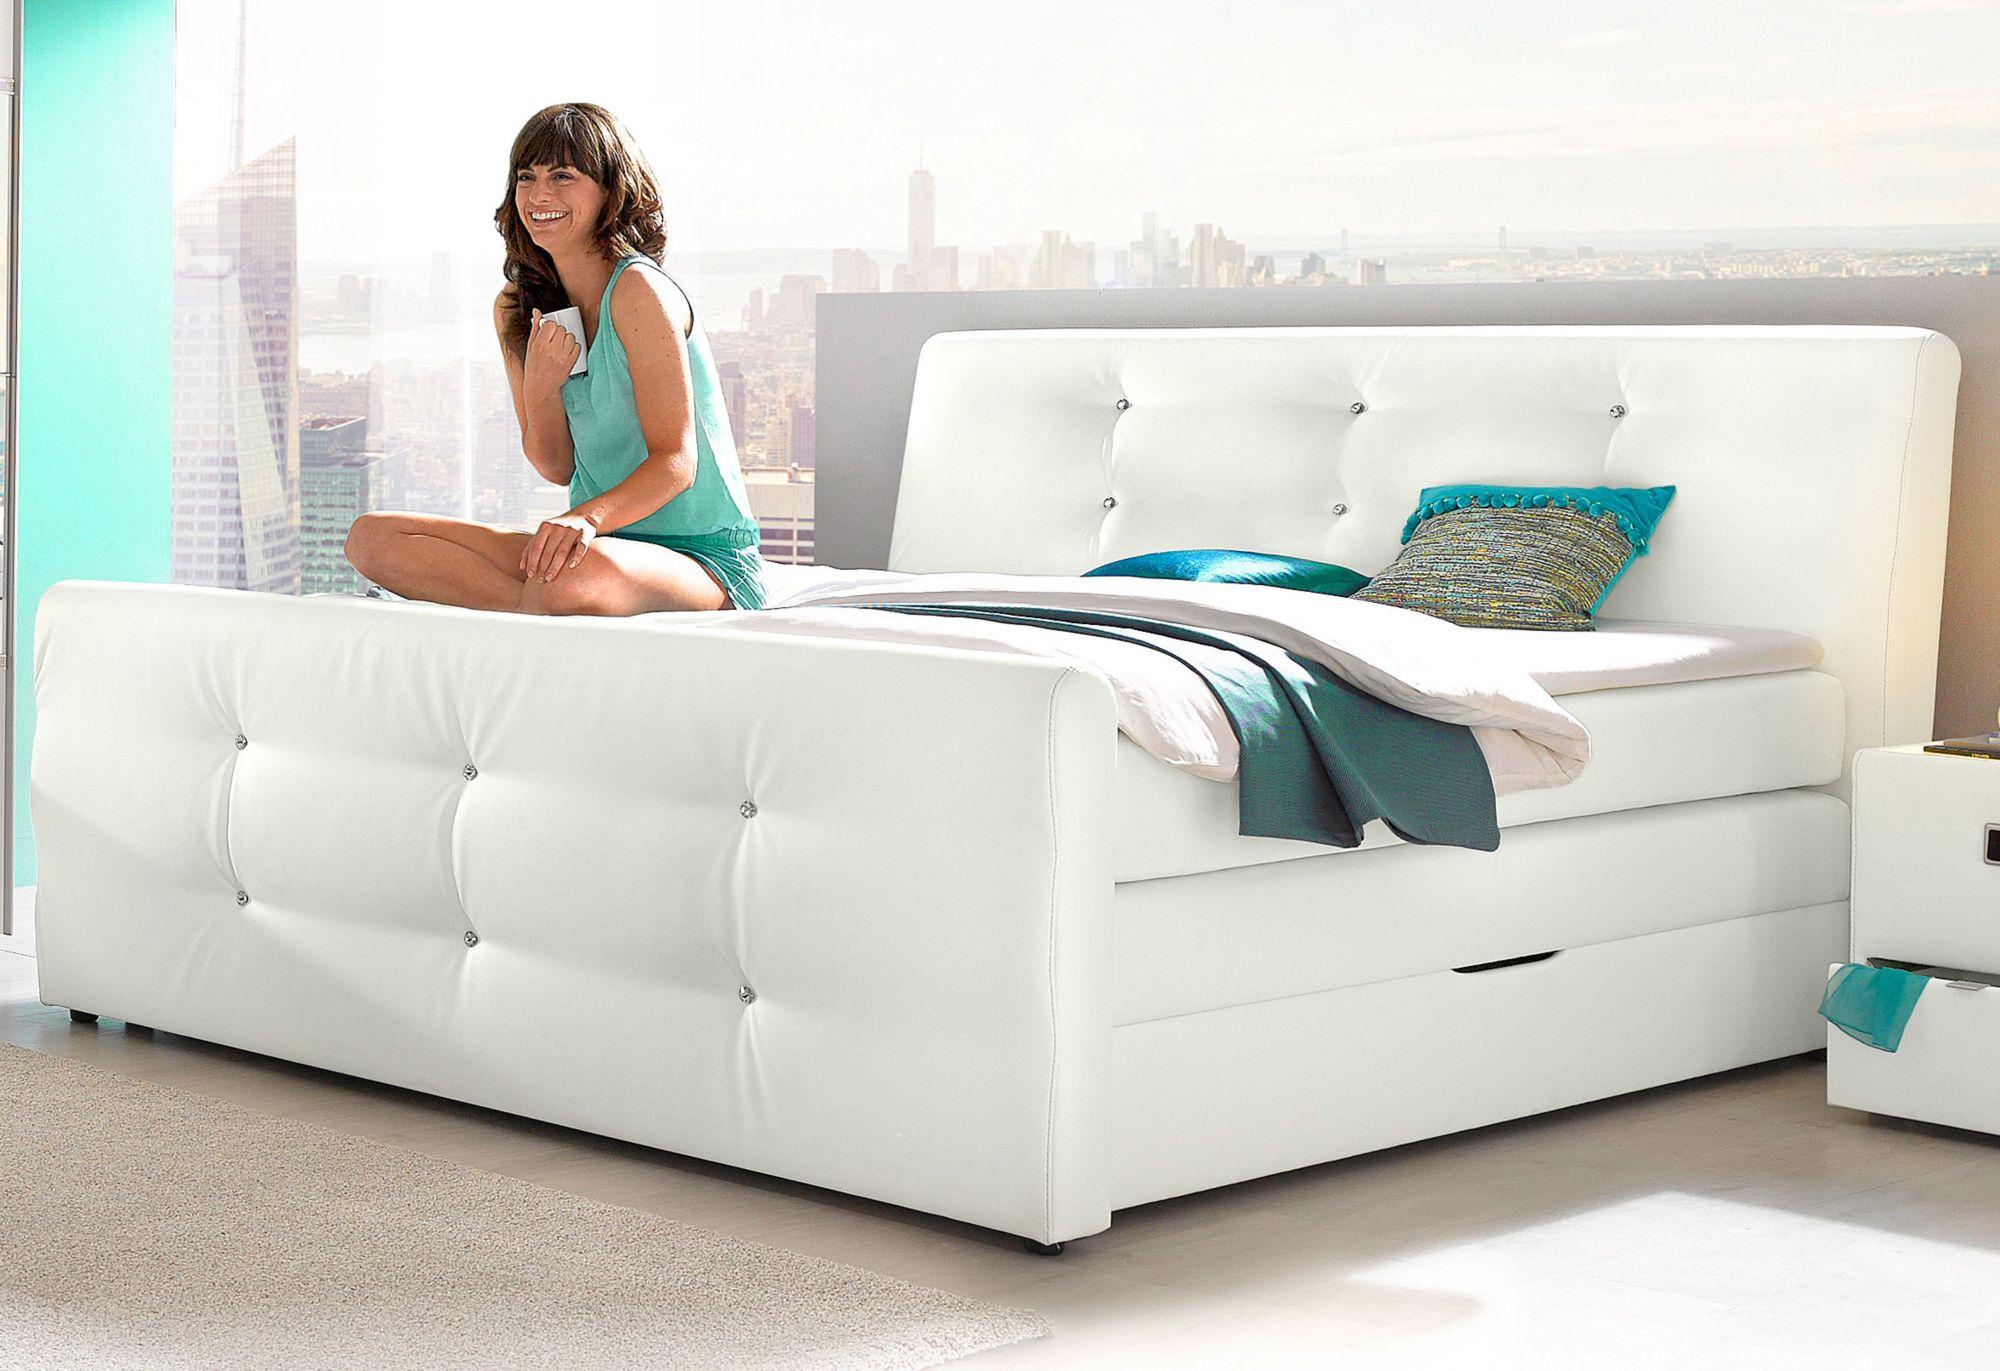 ikea boxspring bett rviksand boxspringbett 160x200 cm. Black Bedroom Furniture Sets. Home Design Ideas